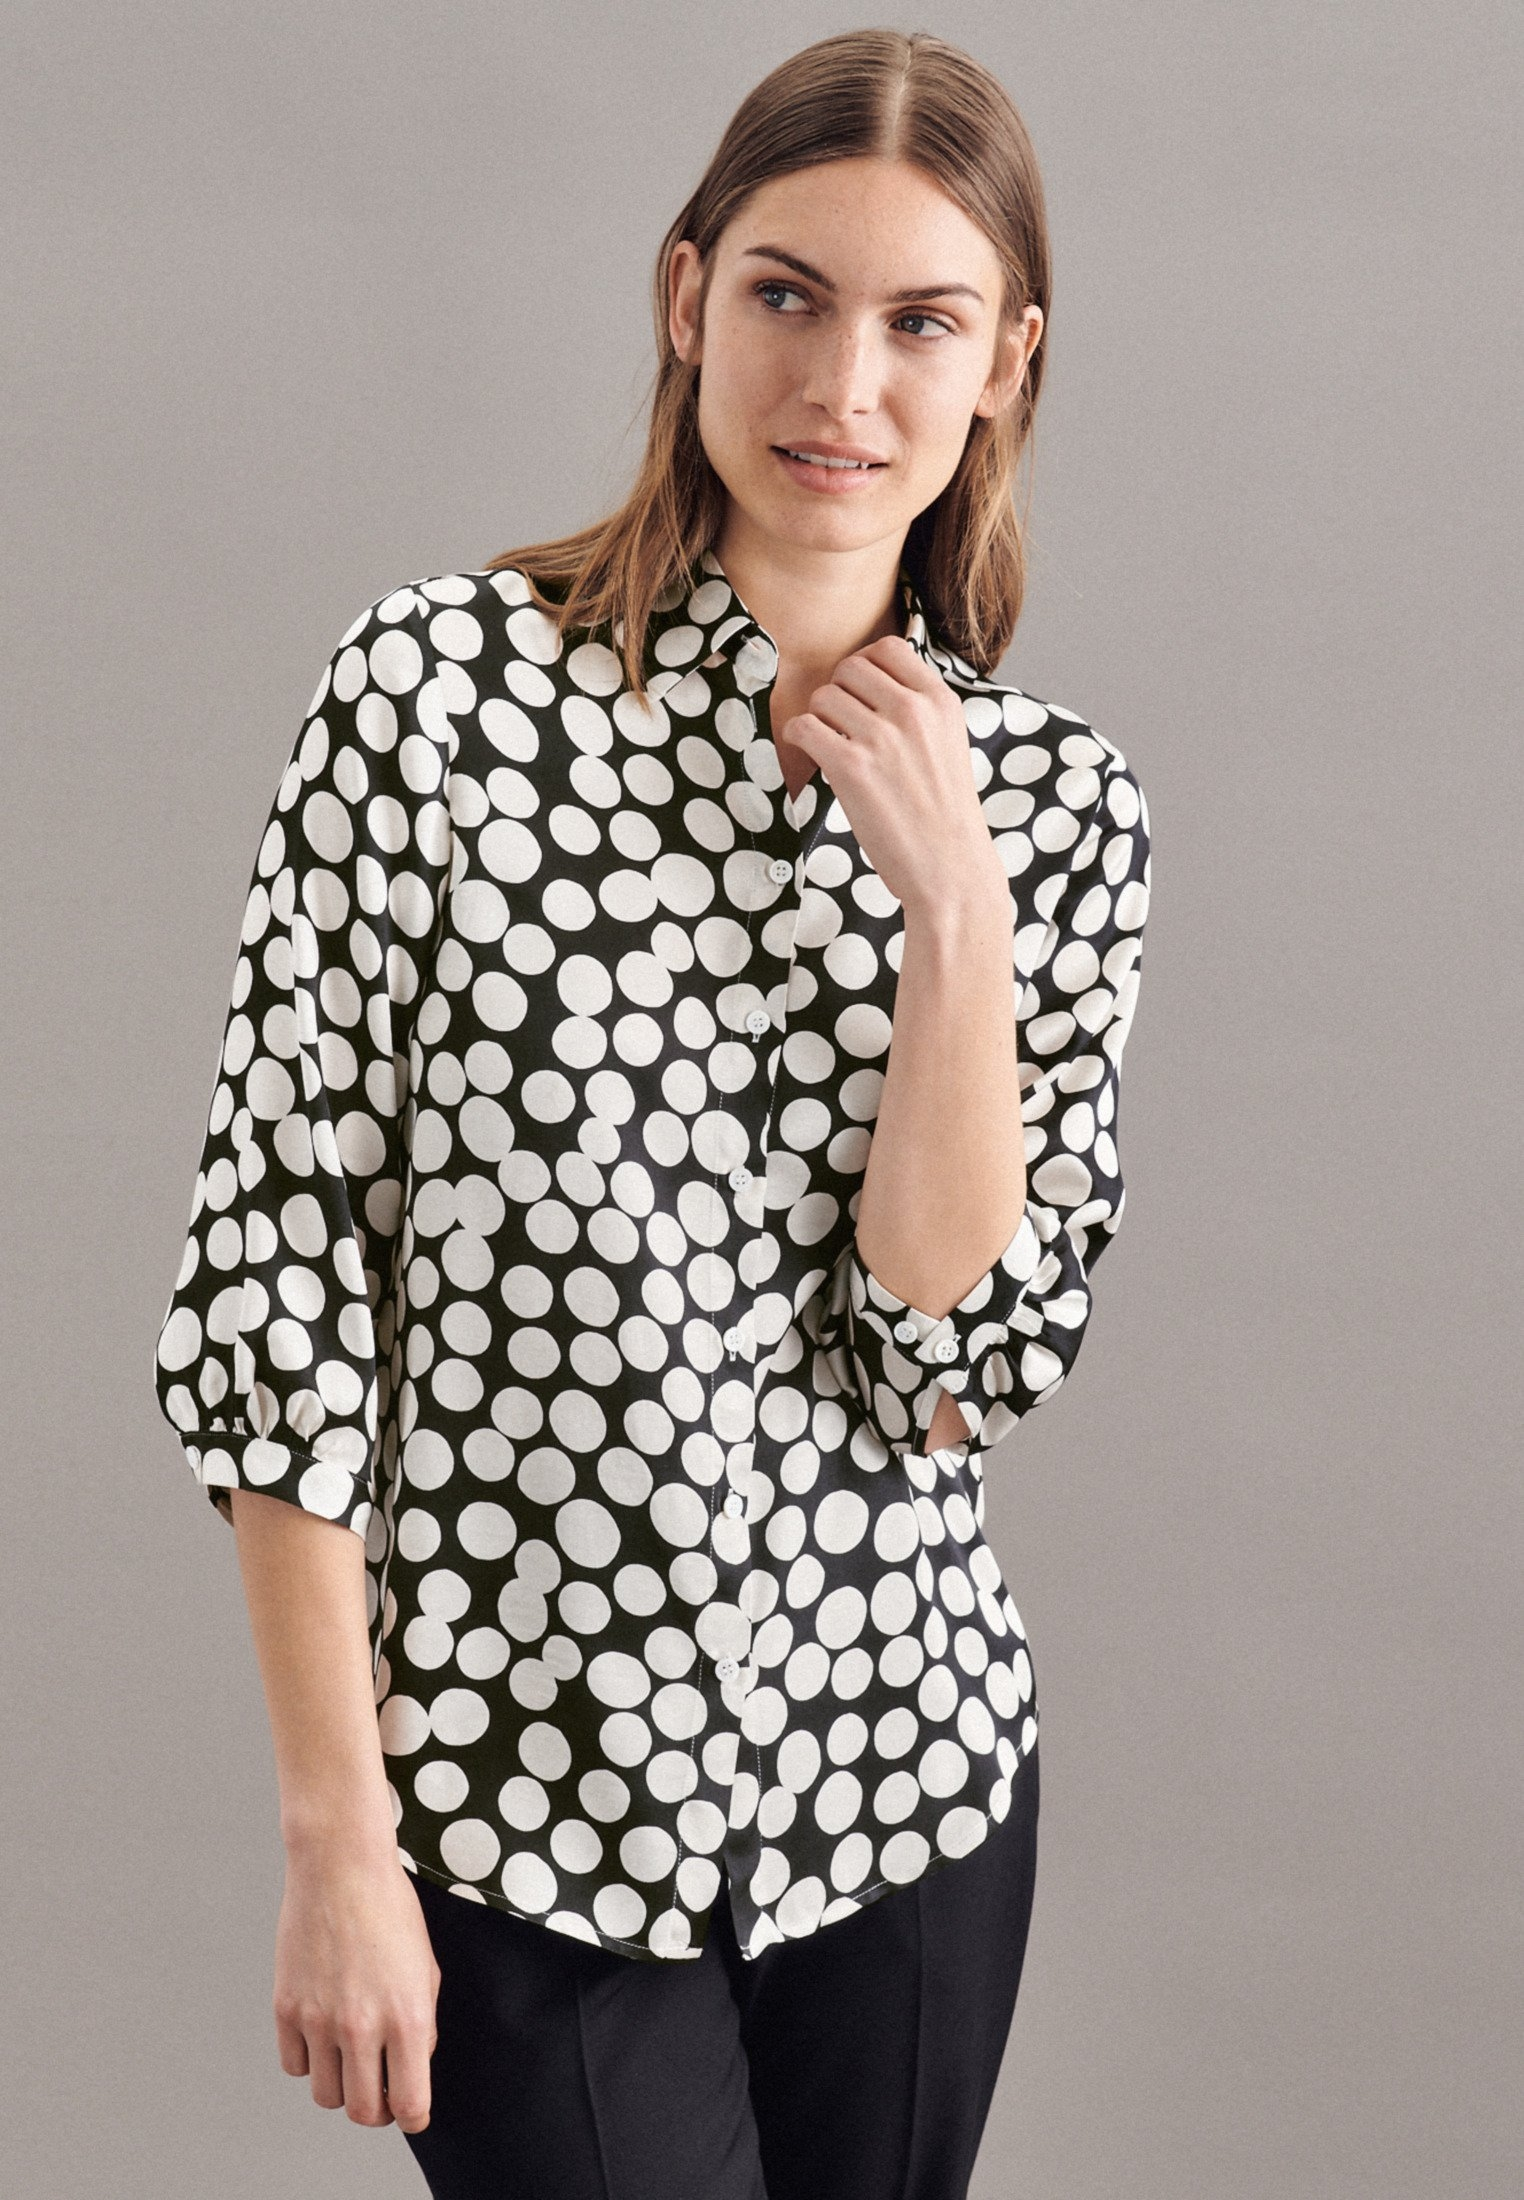 seidensticker Overhemdblouse Zwarte roos 3/4-mouwen kraag stippen bij OTTO online kopen